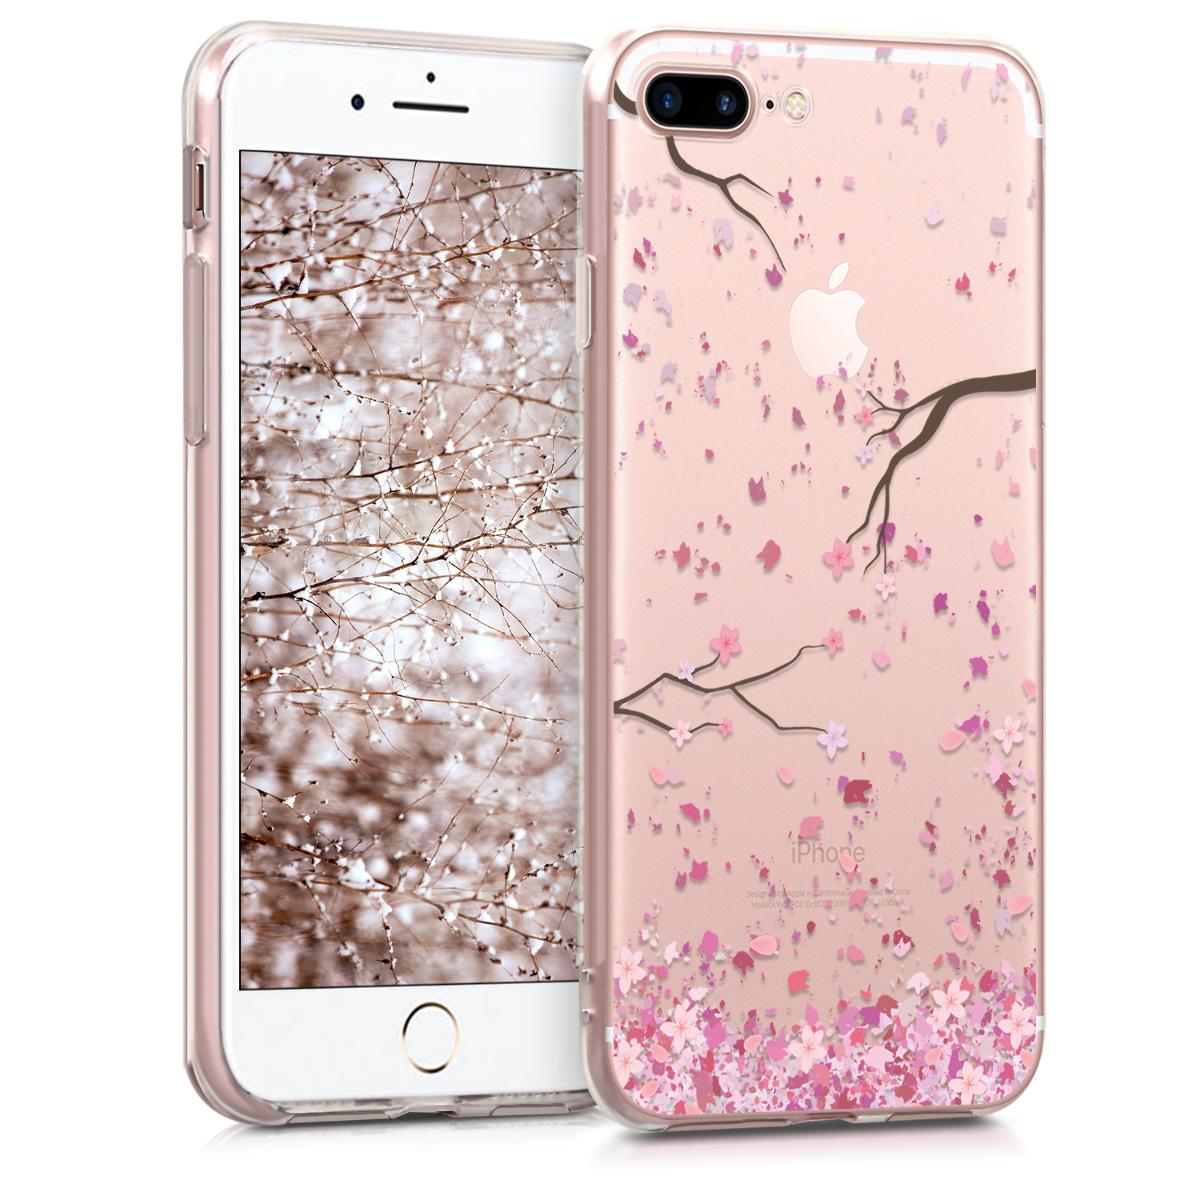 KW Θήκη Σιλικόνης Apple iPhone 7 Plus / 8 Plus - Cherry Blossoms - Light Pink / Dark Brown / Transparent (45352.12)